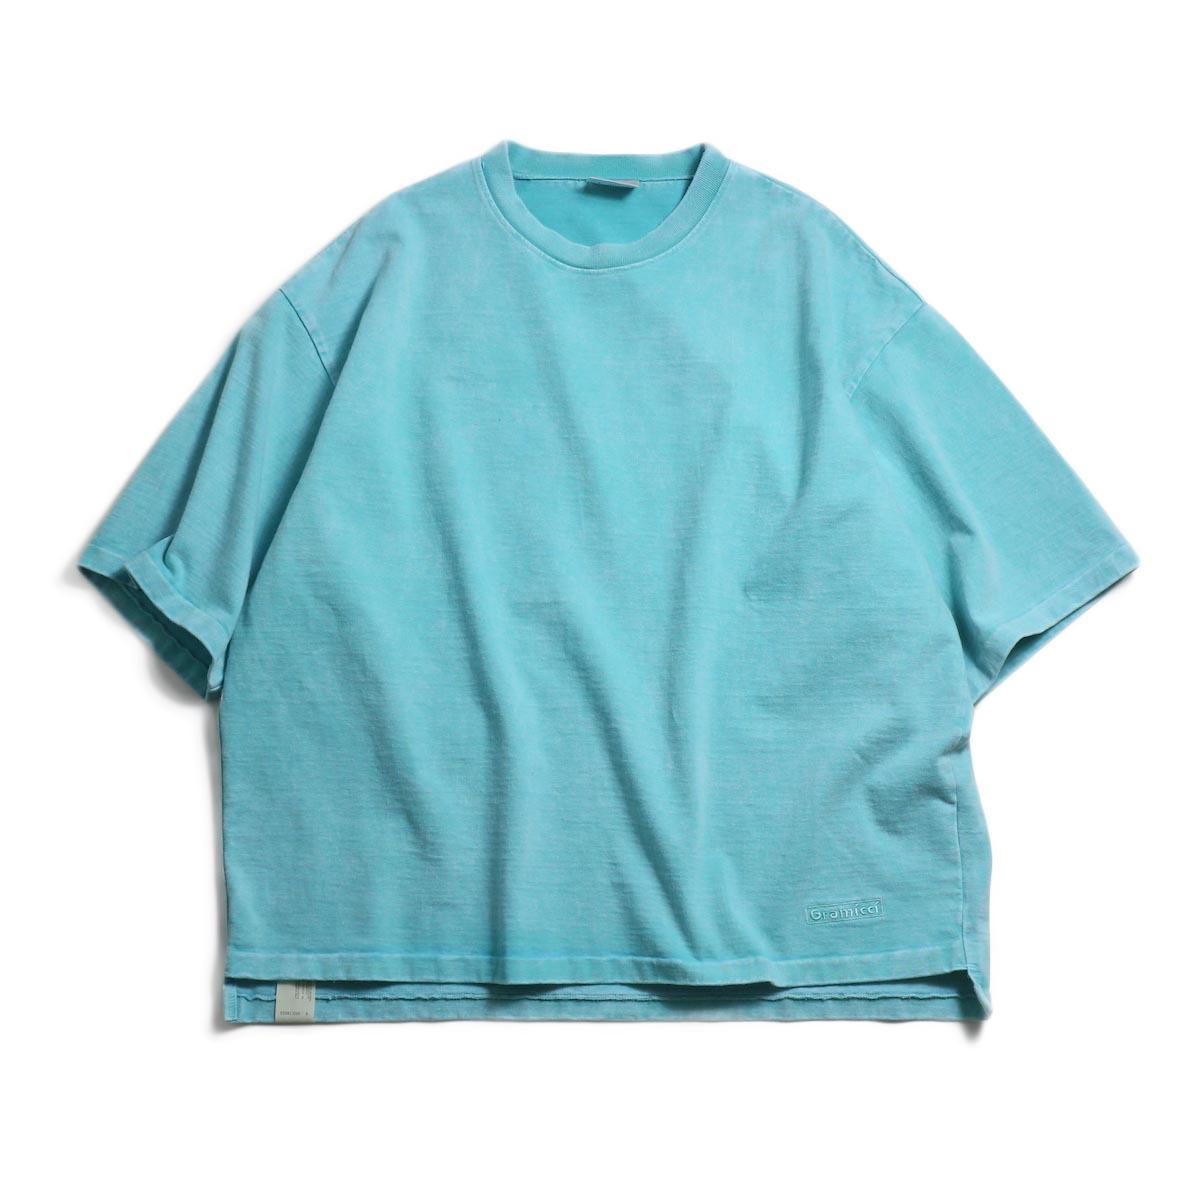 N.HOOLYWOOD × Gramicci  / 191-CS27-024 Short Sleeve Tee -Turquoise